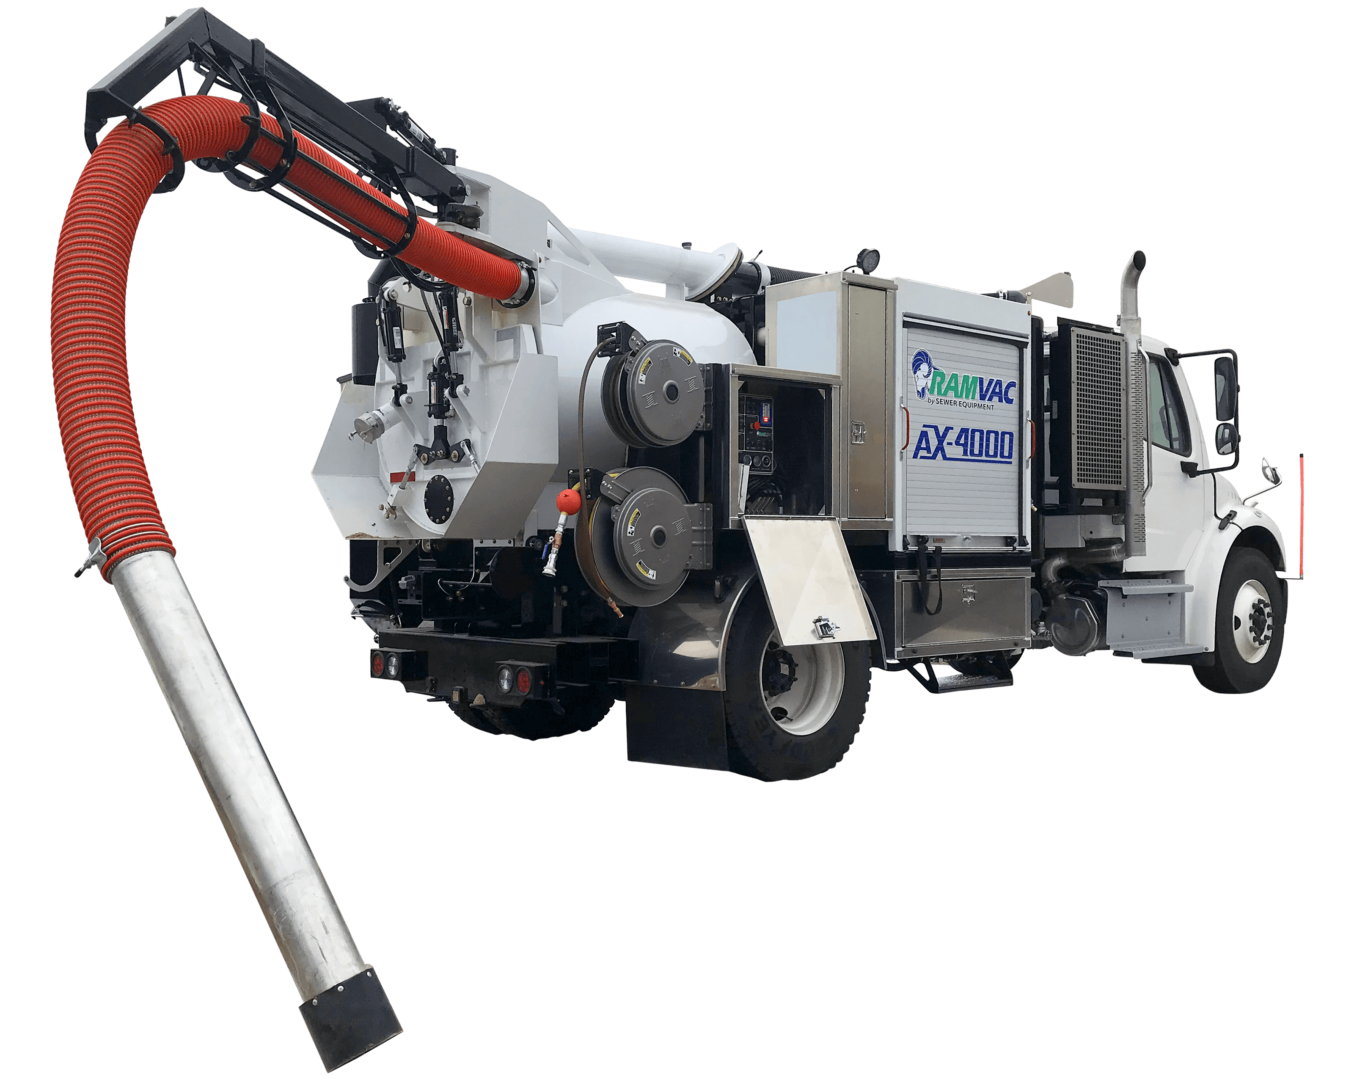 Air Excavator, AX-4000, Ramvac